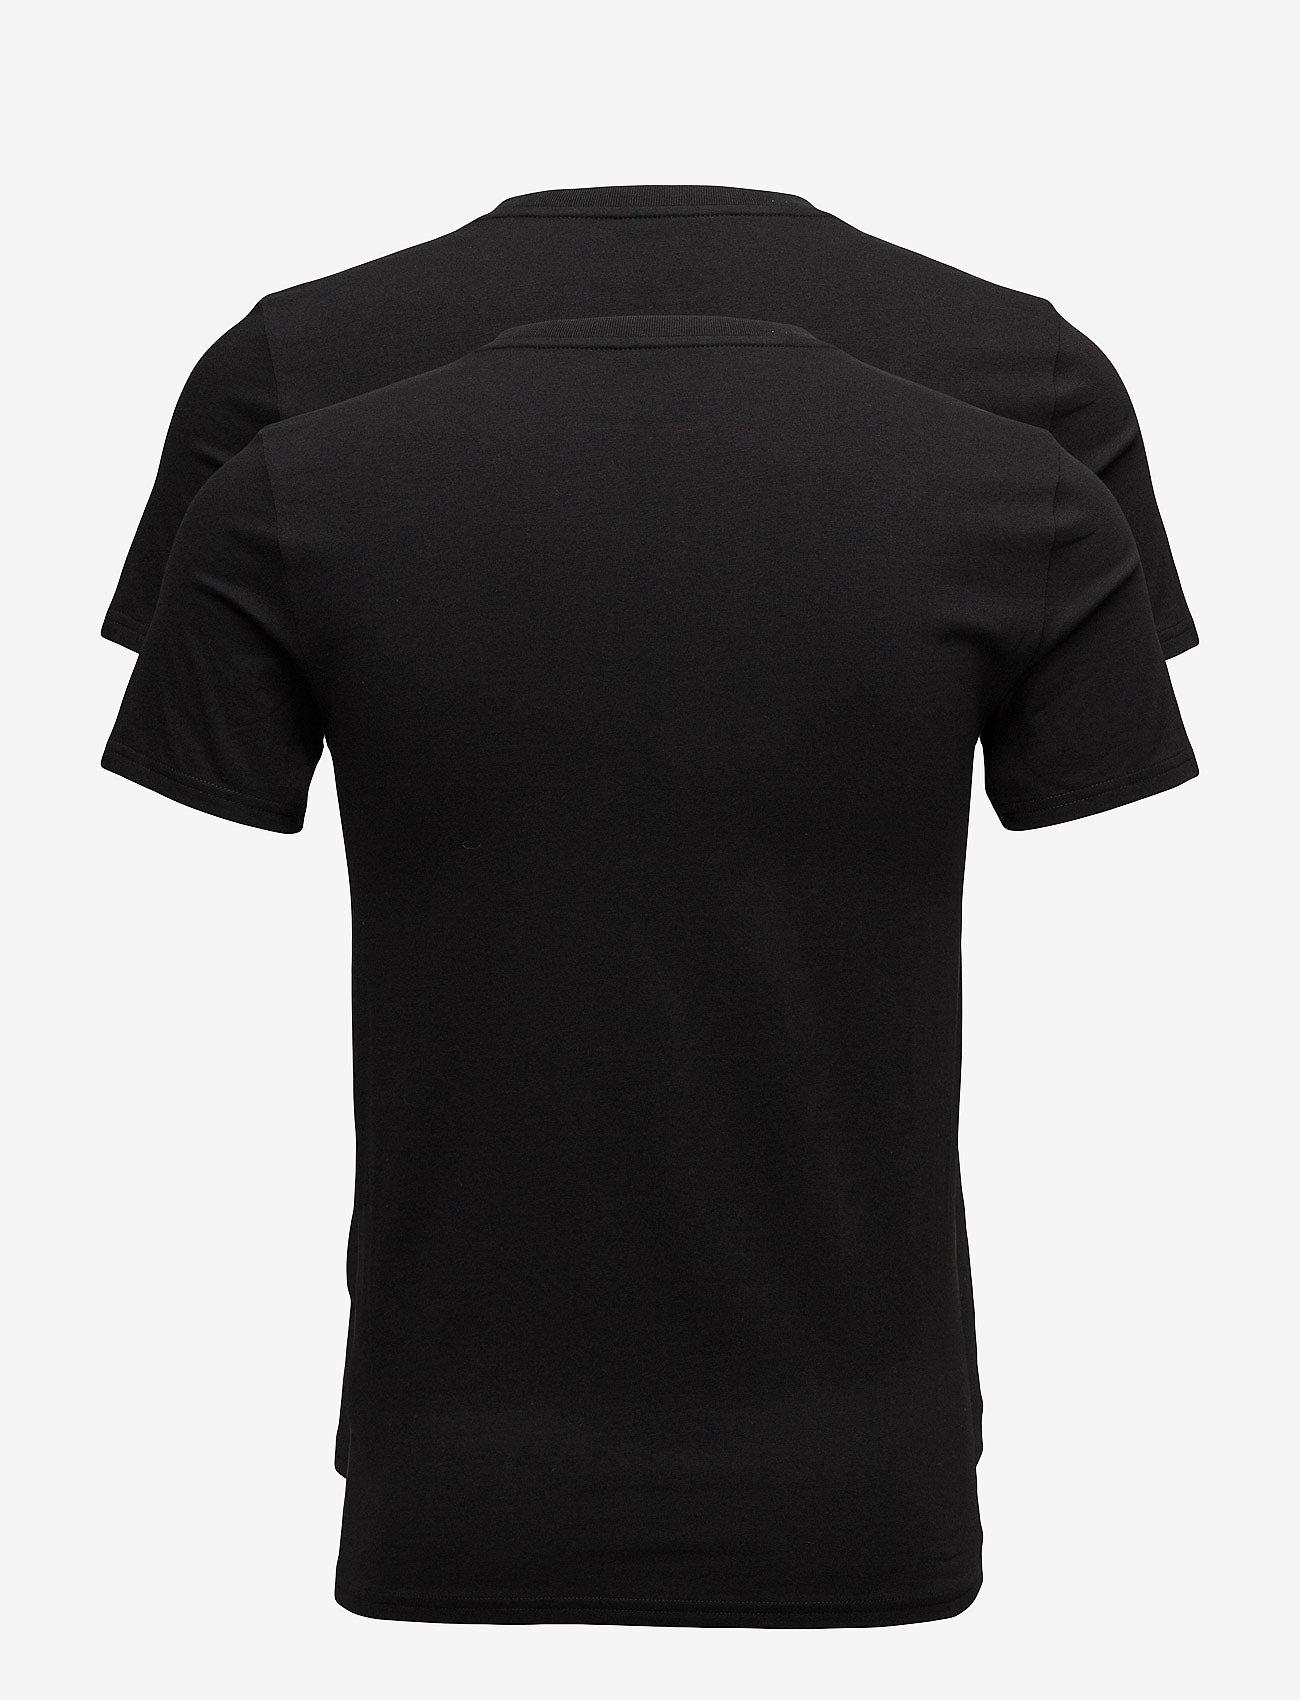 Polo Ralph Lauren Underwear - Crewneck T-Shirt 2-Pack - multipack - 2pk polo black - 1